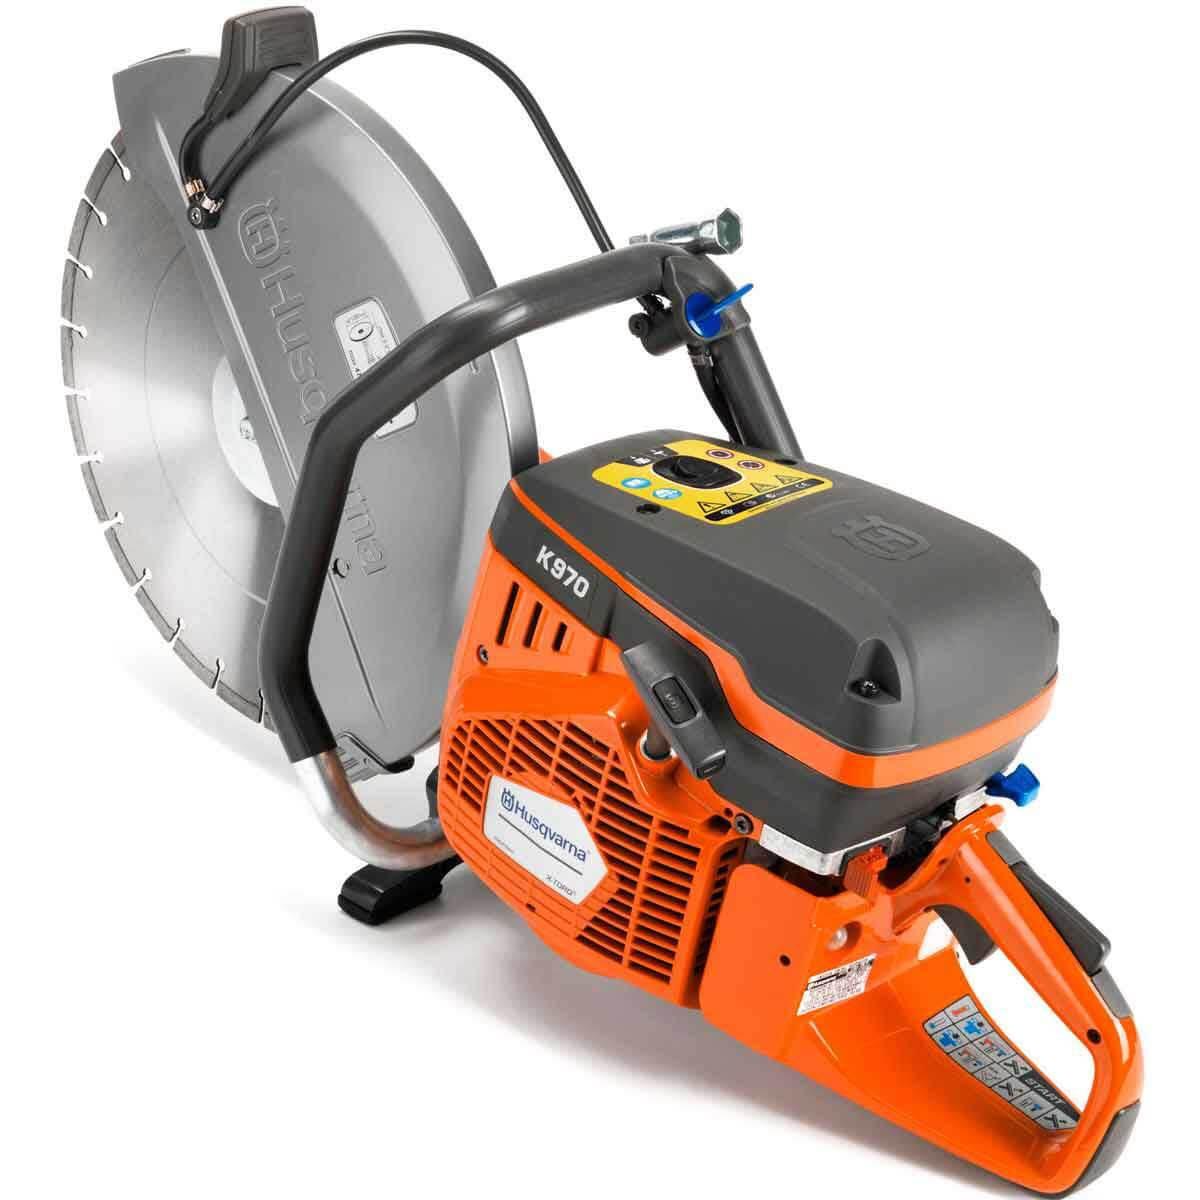 Husqvarna K970 power cutter